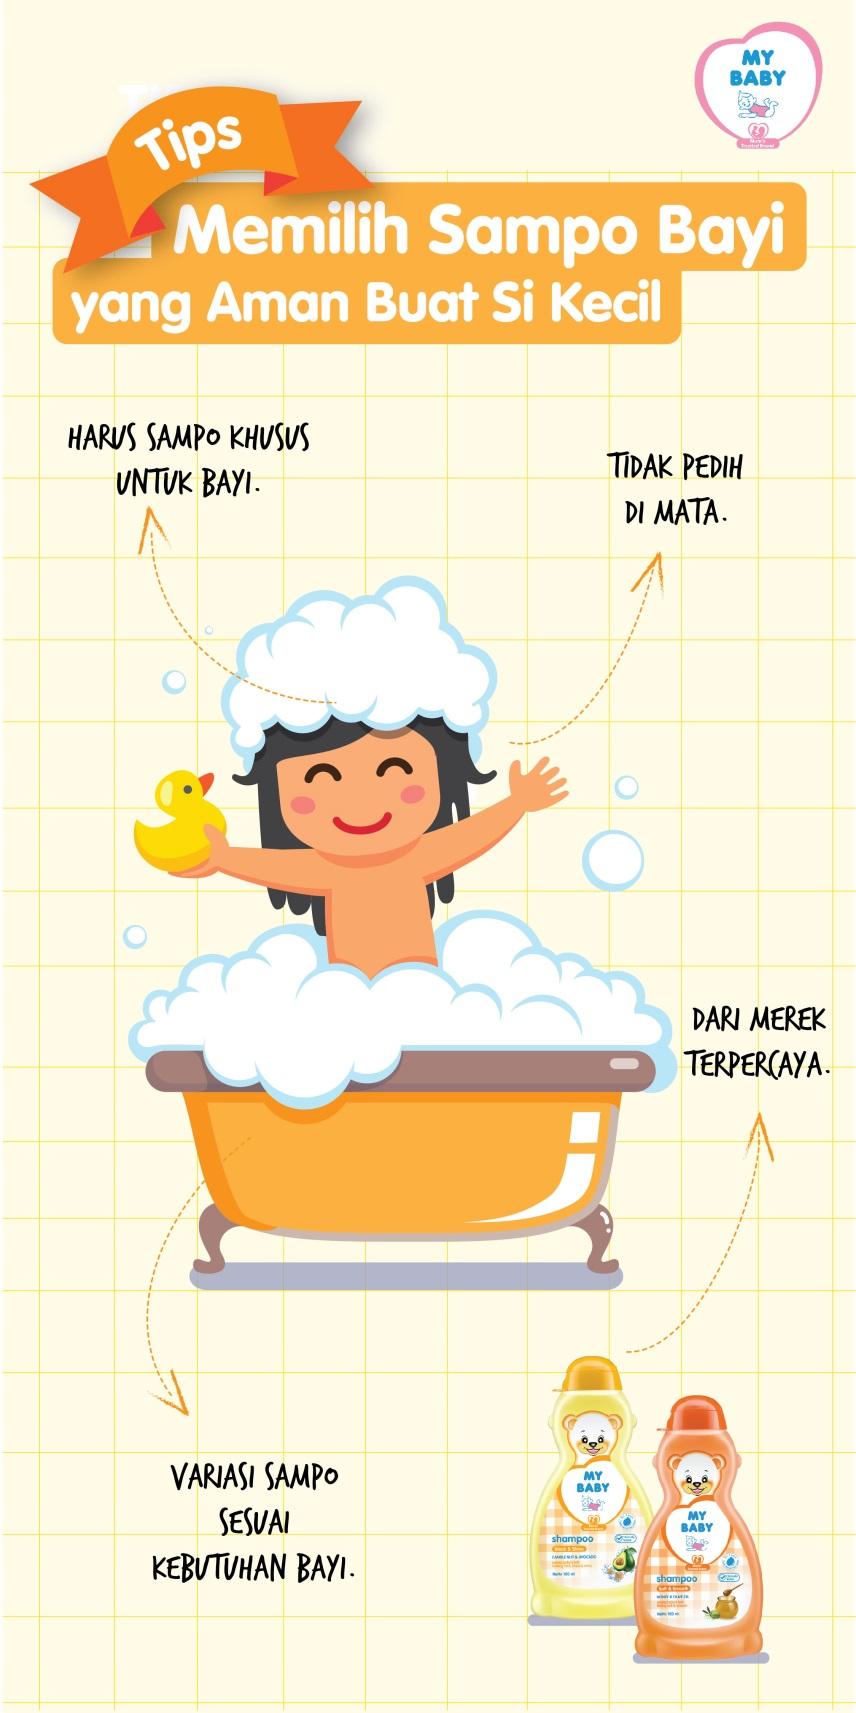 Tips Memilih Sampo Bayi Yang Aman Buat Si Kecil